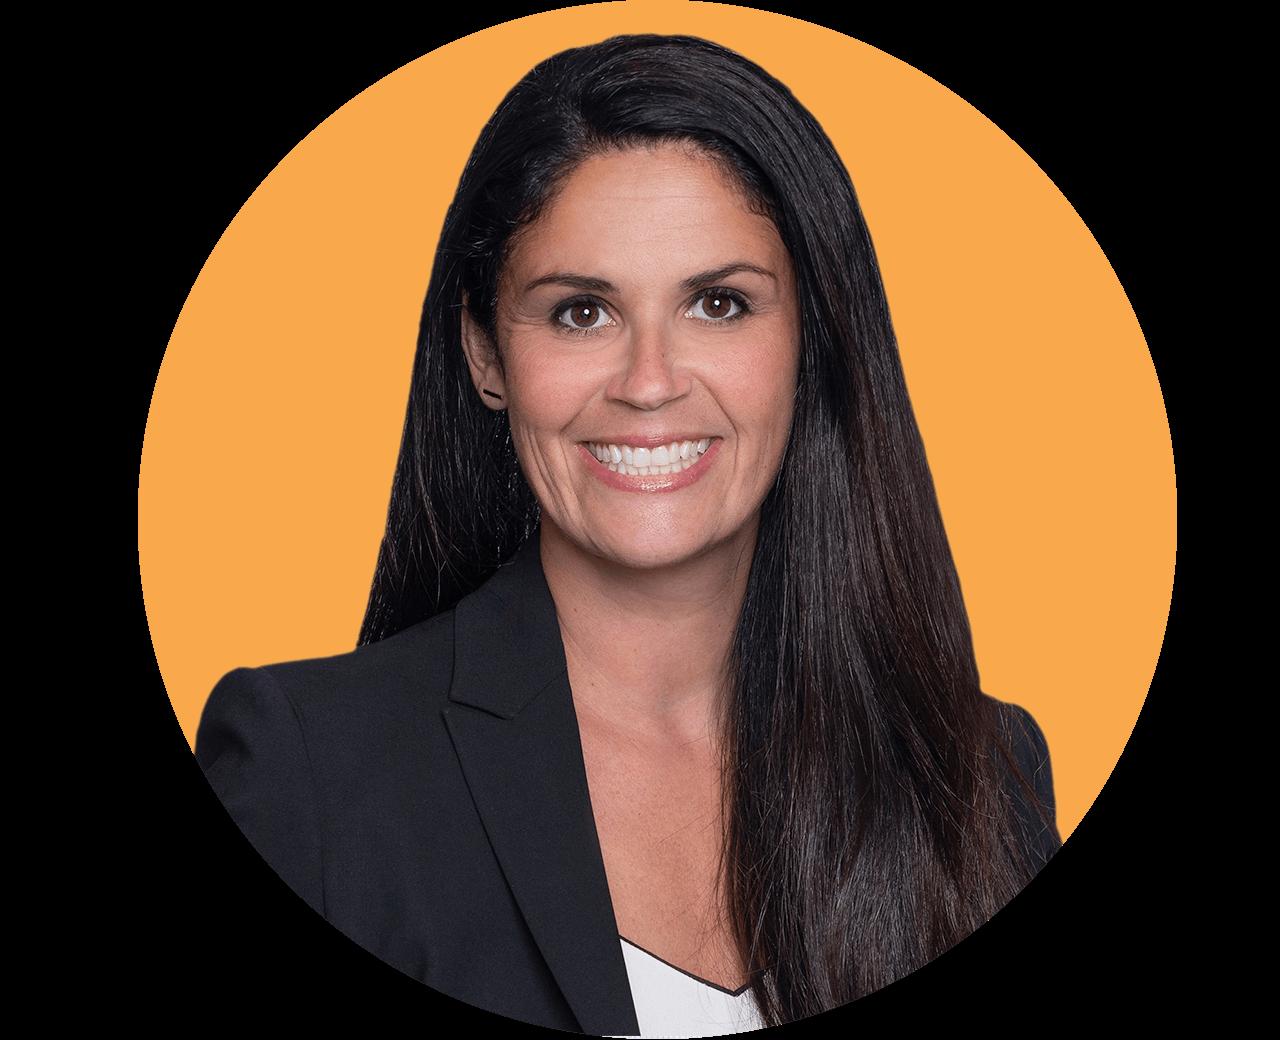 Susan Vitale - Chief Marketing Officer